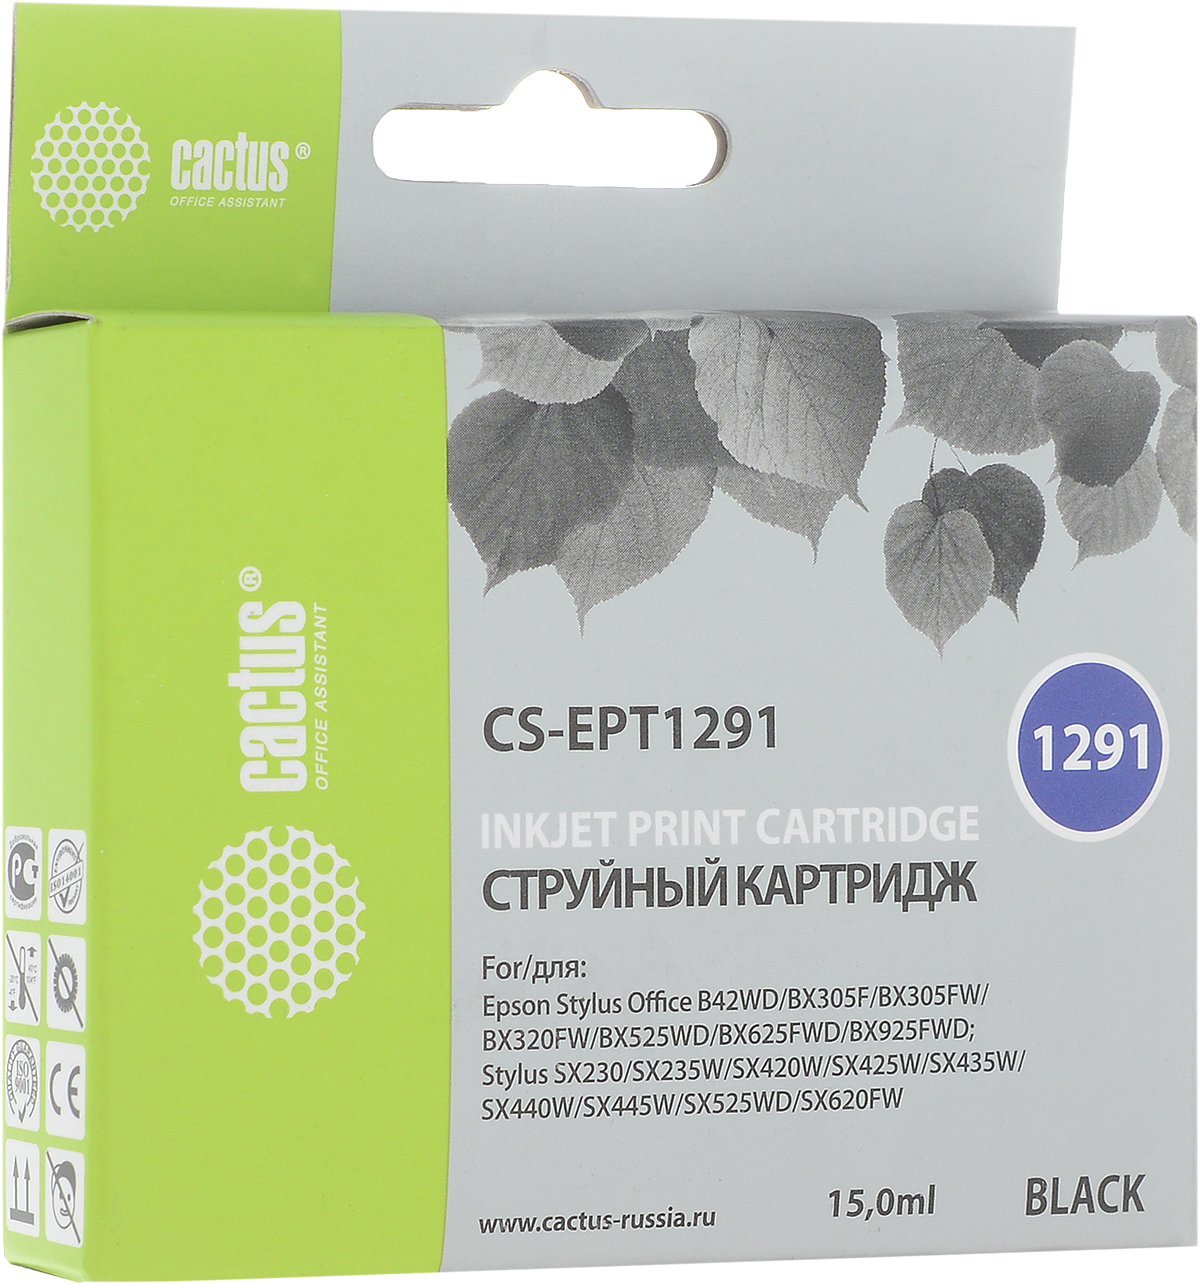 Cactus CS-EPT1291, Black струйный картридж для Epson Stylus Office B42/BX305/BX305F/BX320 картридж для принтера и мфу cactus cs ept0481 black